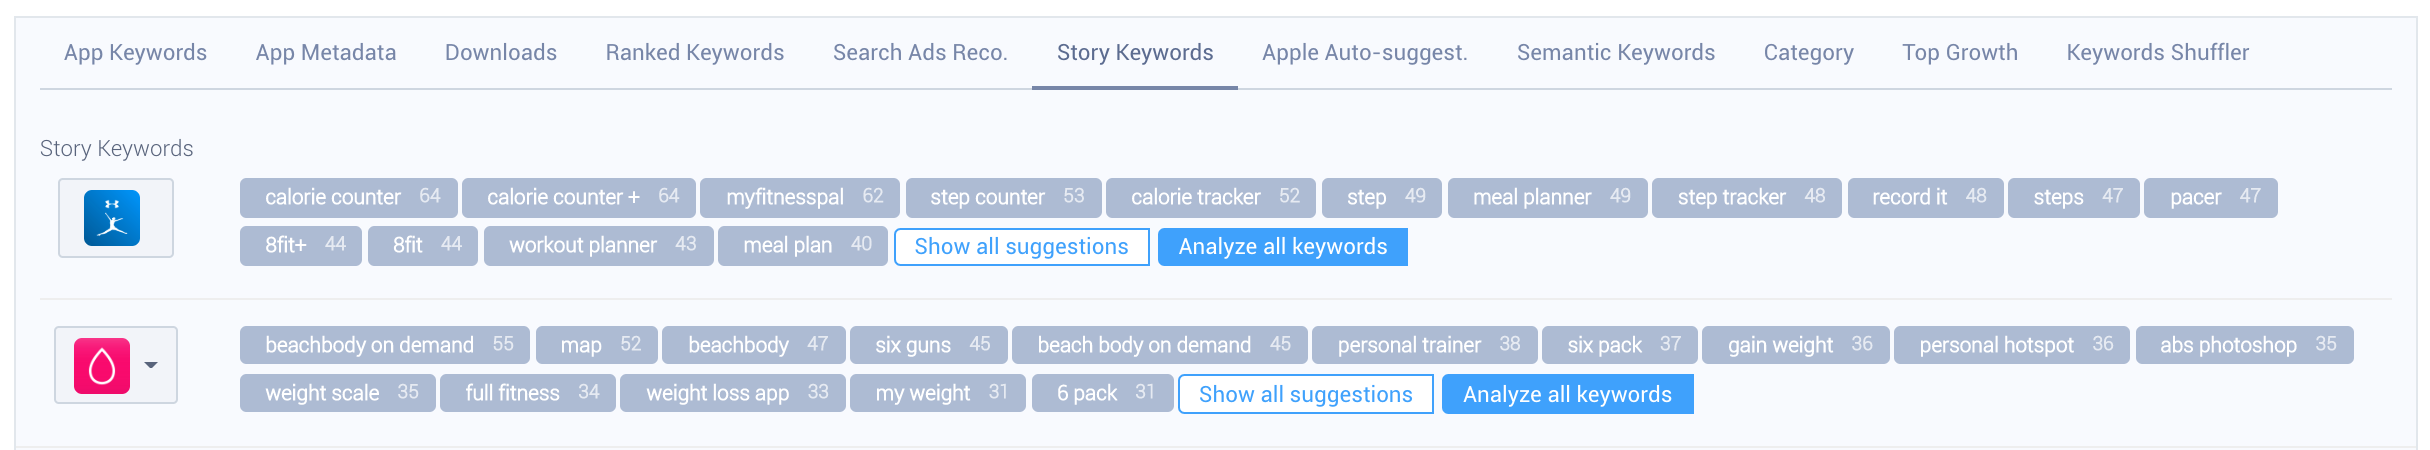 Comparing the top Story keywords of MyFitnessPal vs. Sweat: Kayla on AppTweak.